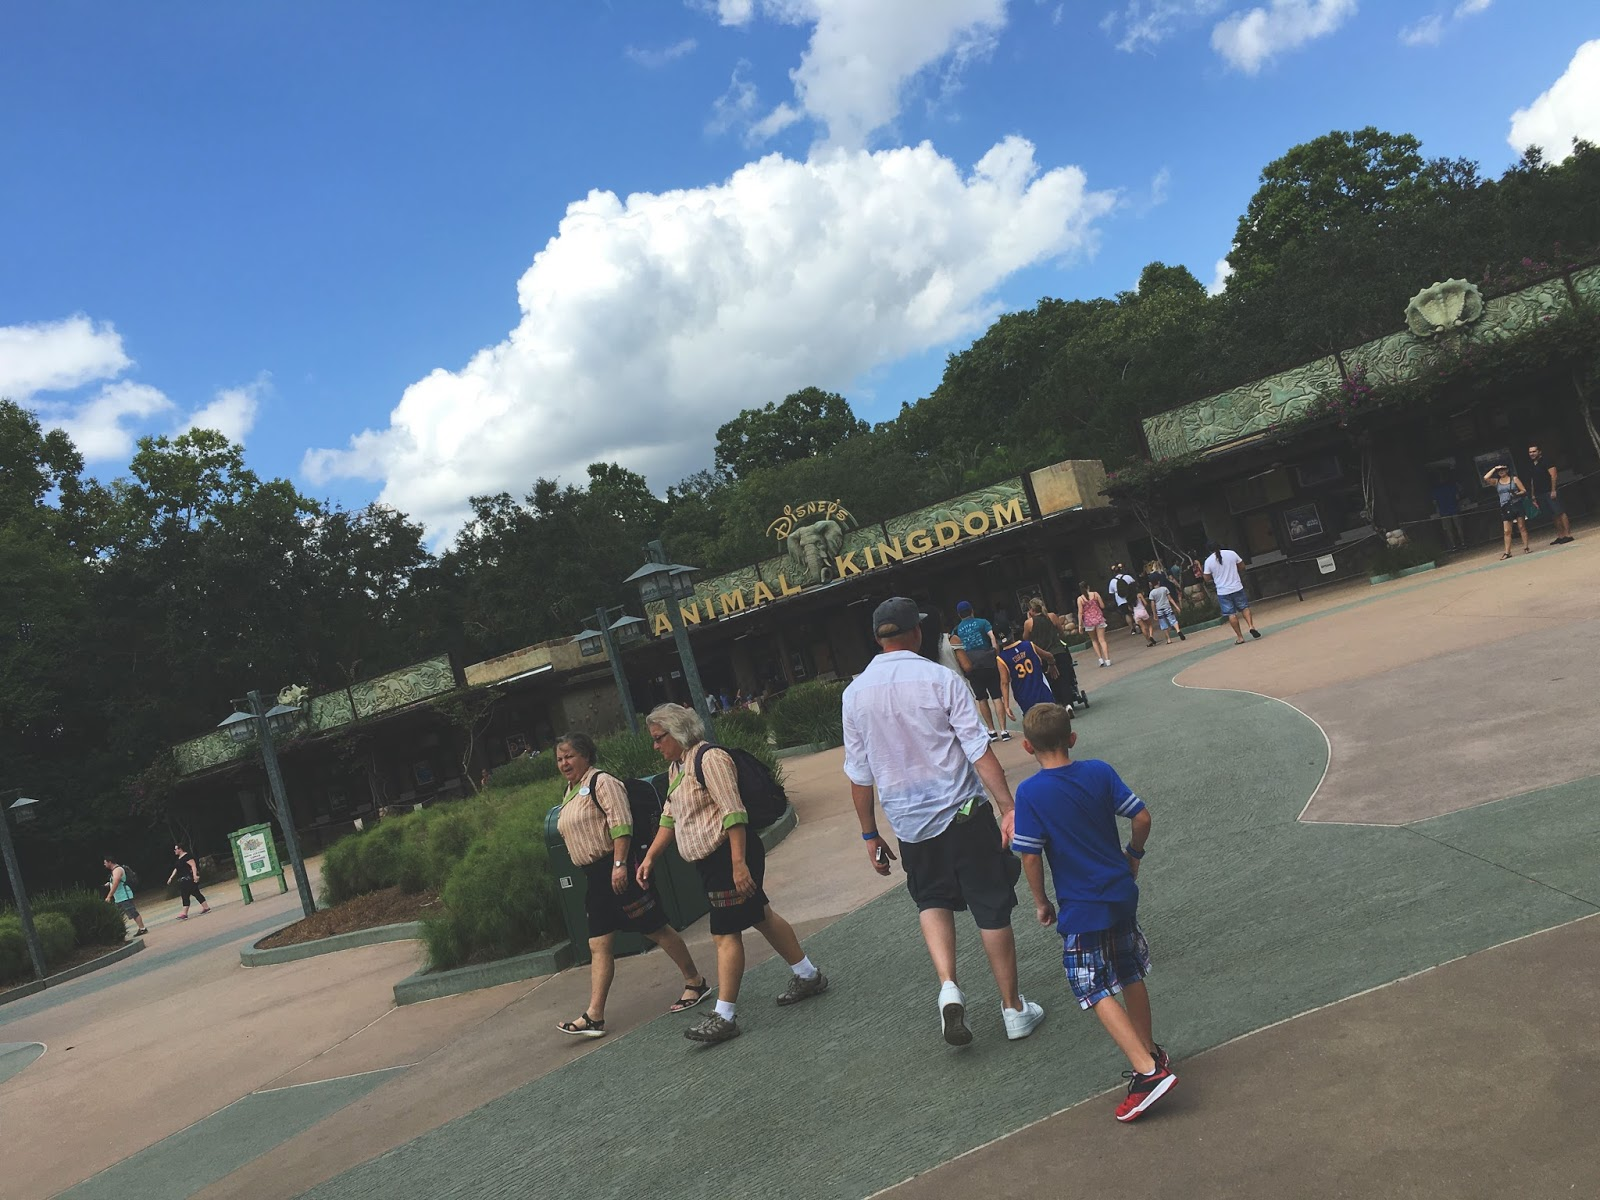 Animal Kingdom in Disney World, Florida